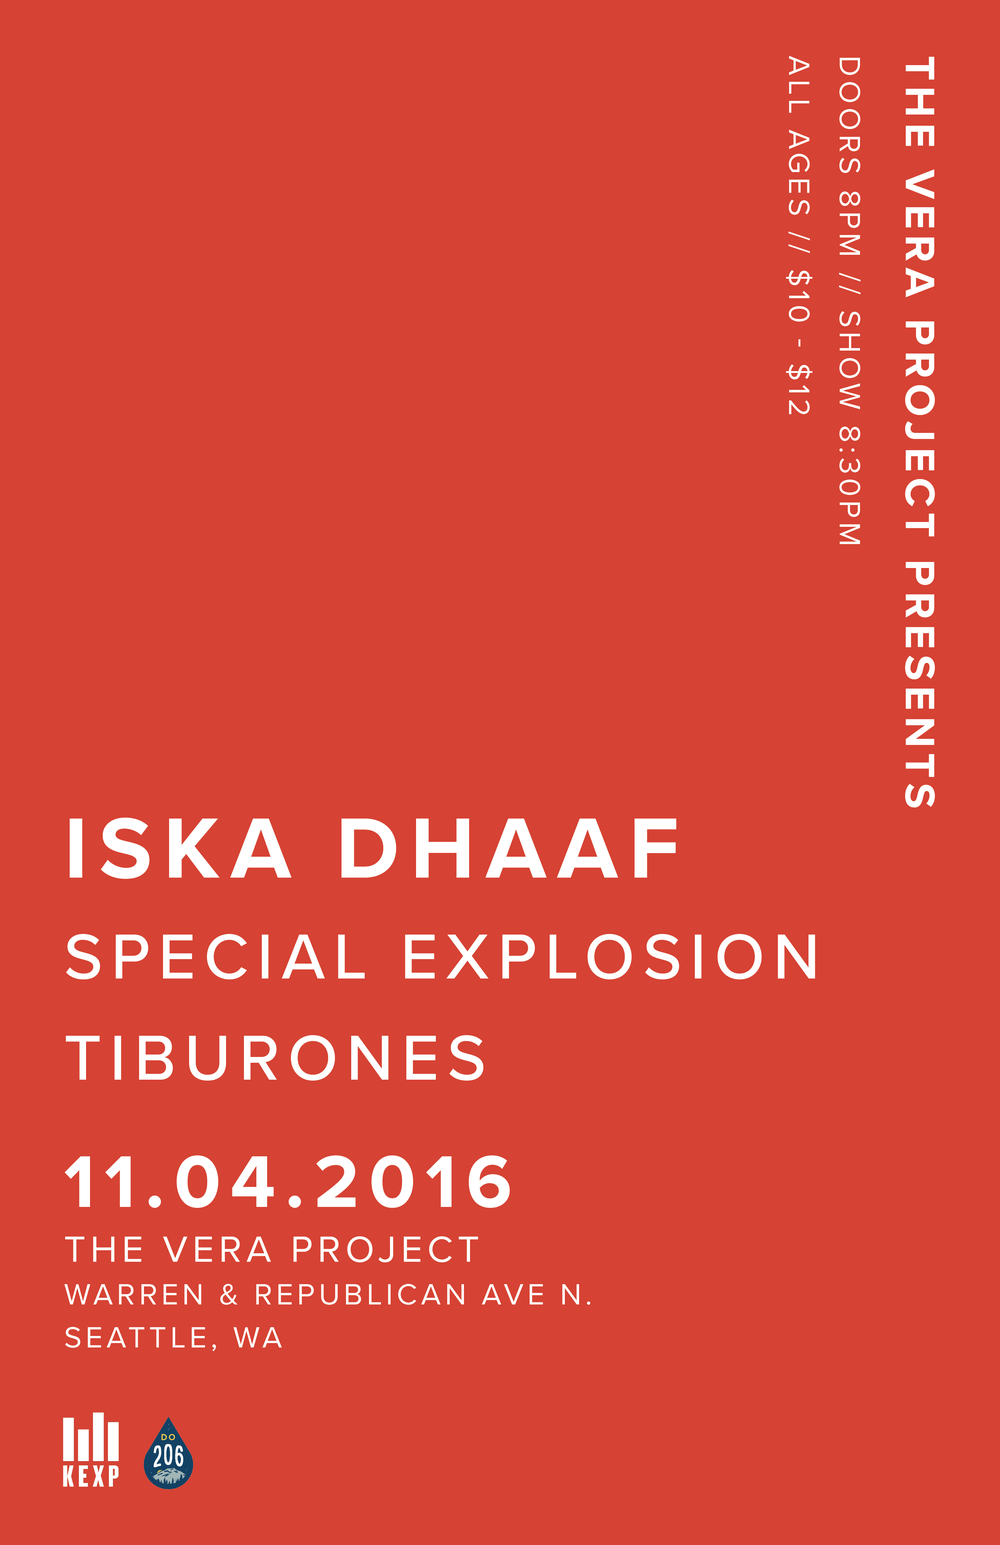 Iska_Dhaaf_Vera_Poster_w_sponsors.png